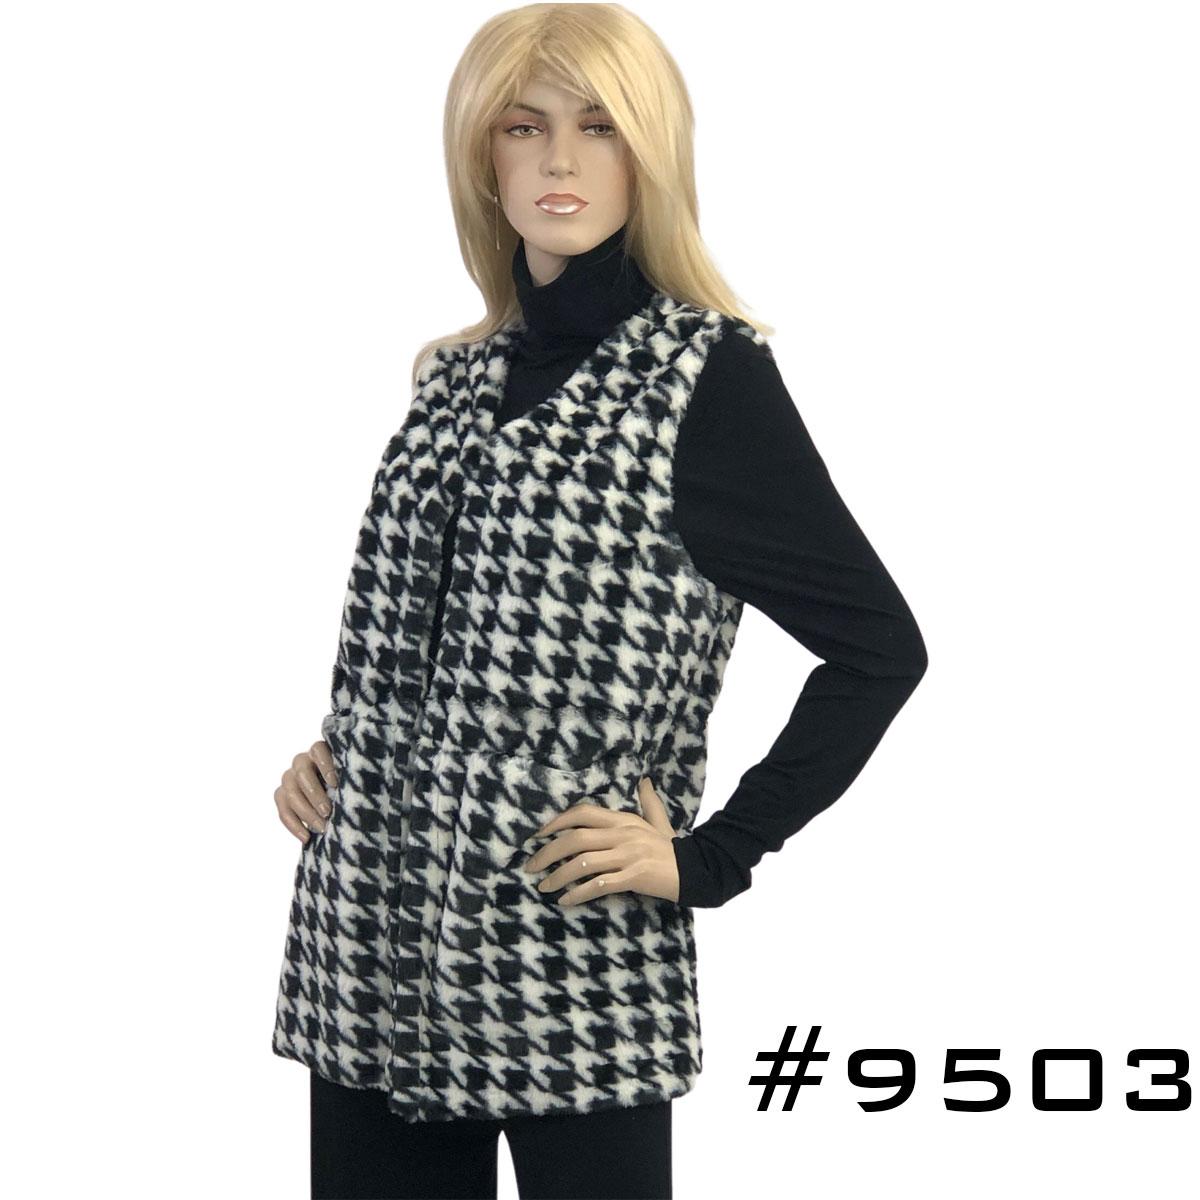 Houndstooth Print Faux Fur Vest 9503